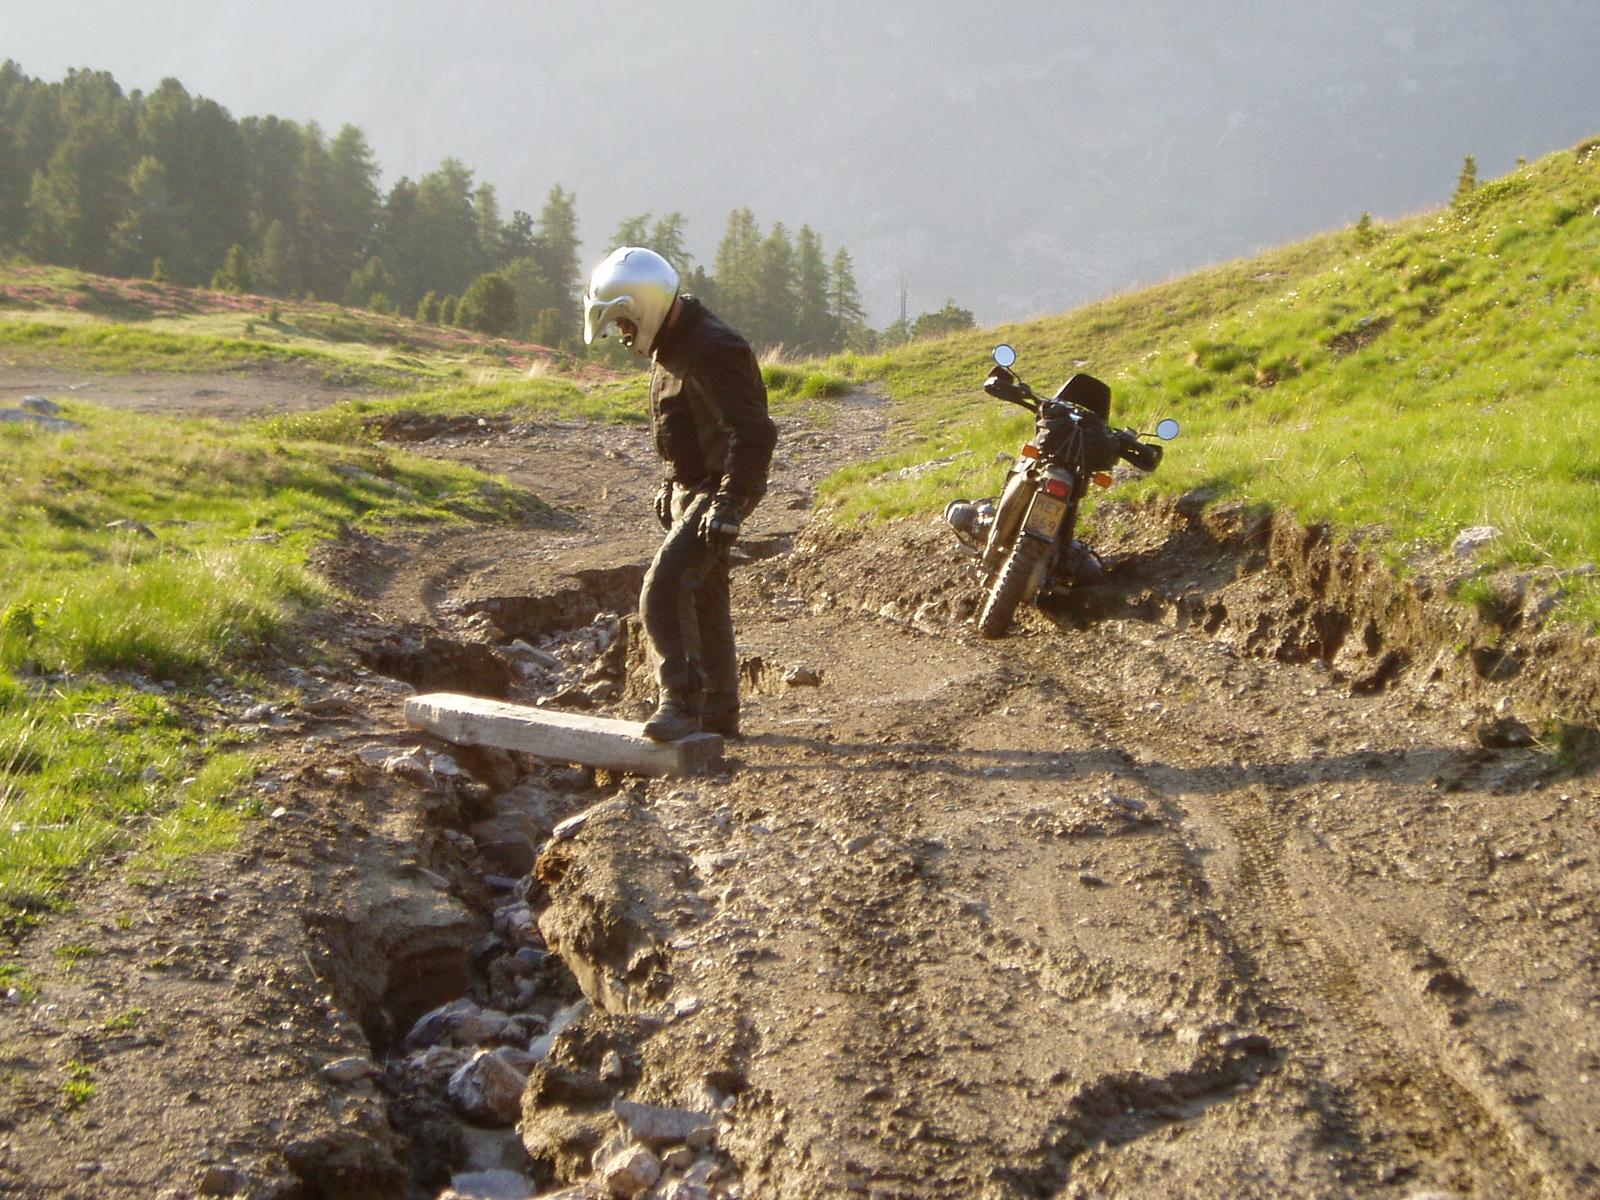 Ausschwemmungen langs 1 = Langsgroeven door (smelt)watererosie